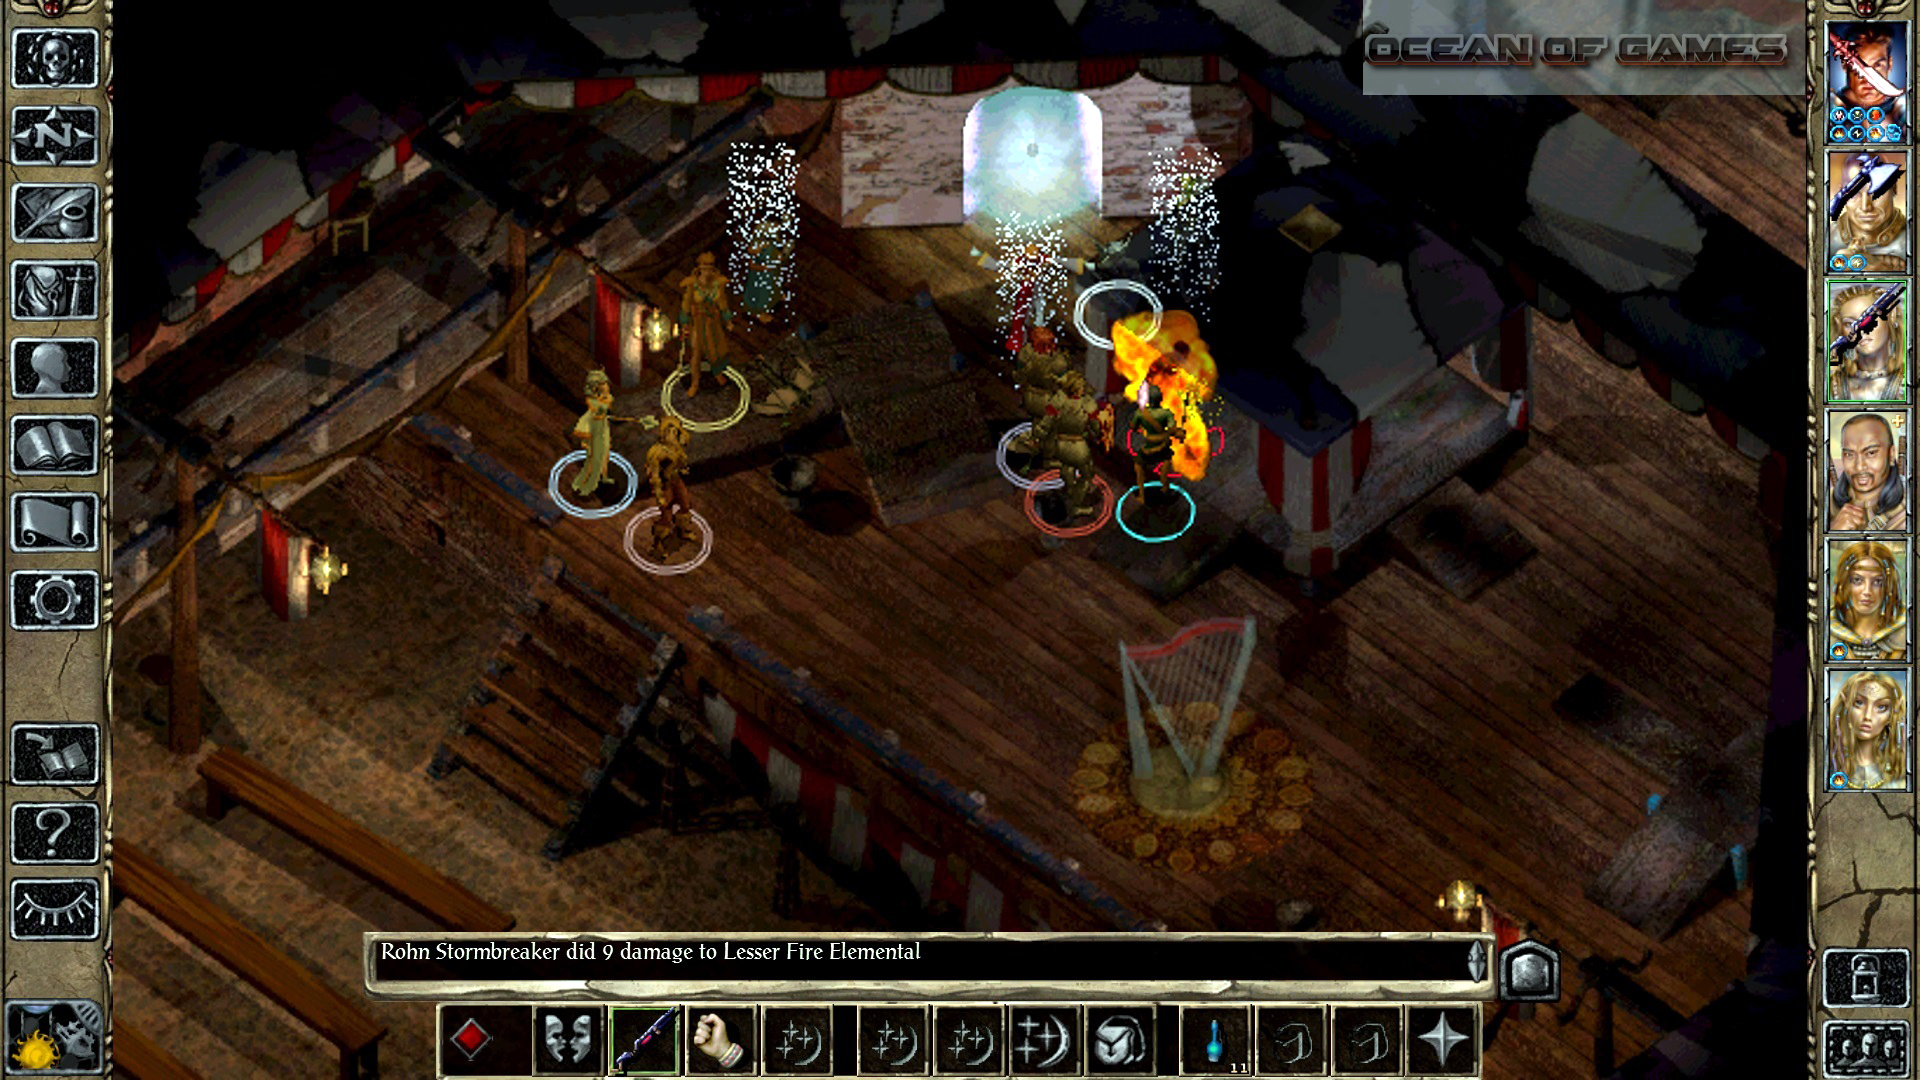 Baldur's Gate 2 Download For Free